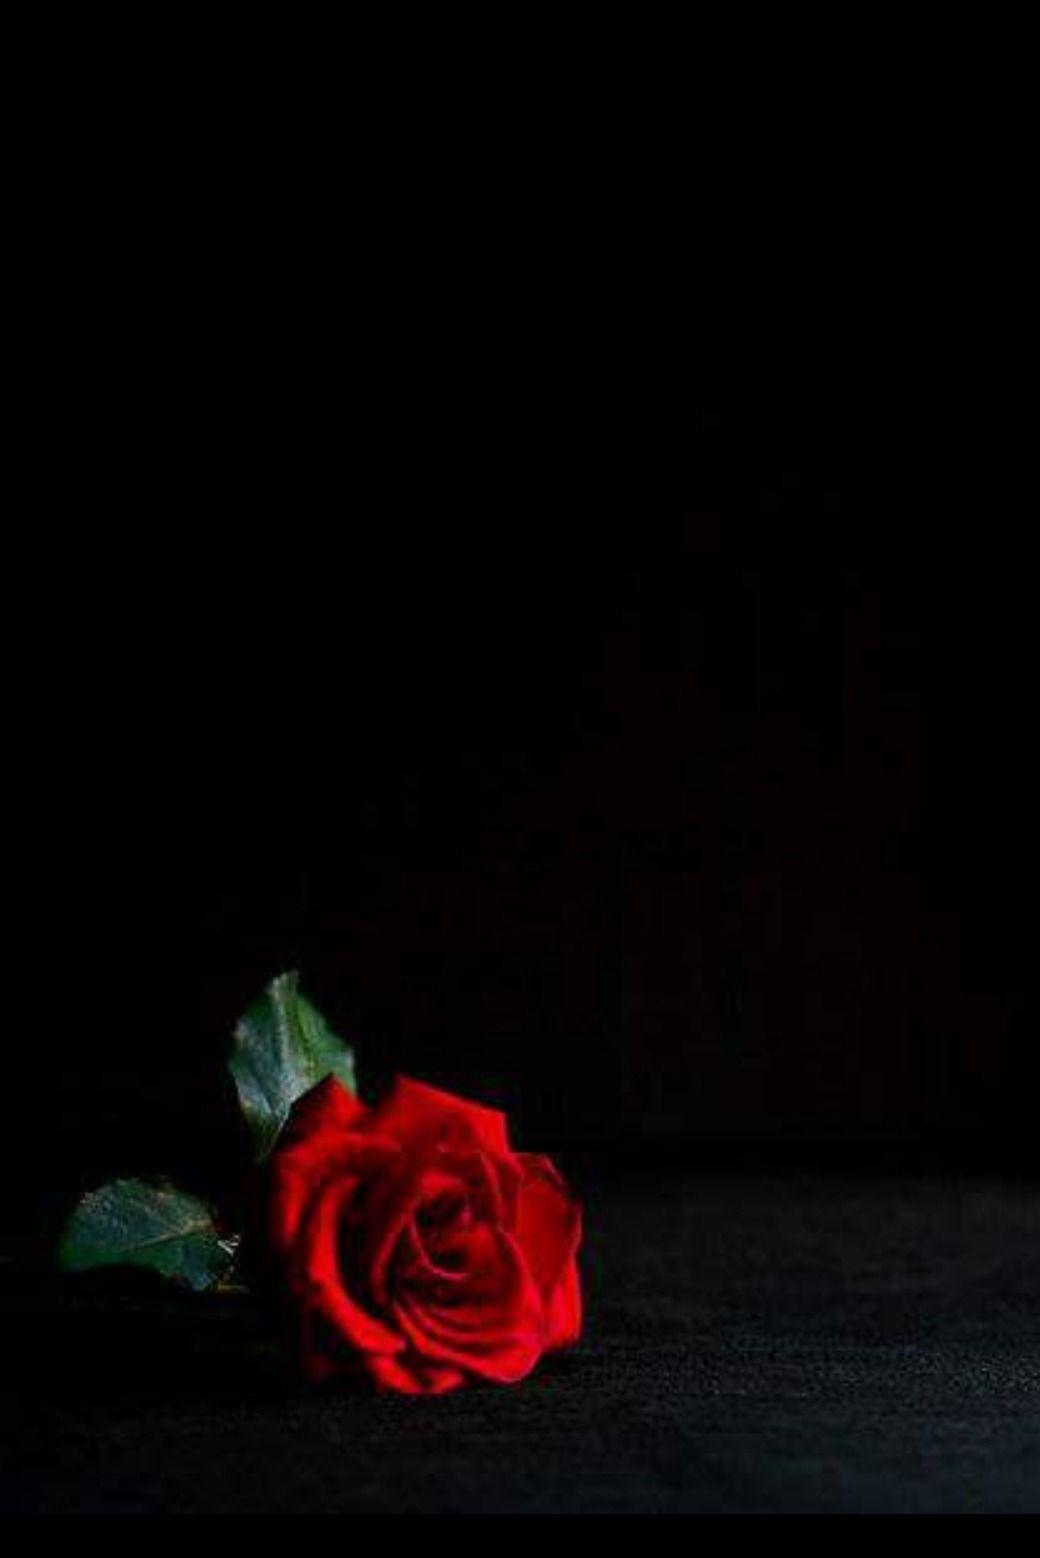 Pin By Lina Garcia On San Valentin Rose Wallpaper Flower Phone Wallpaper Red Roses Wallpaper